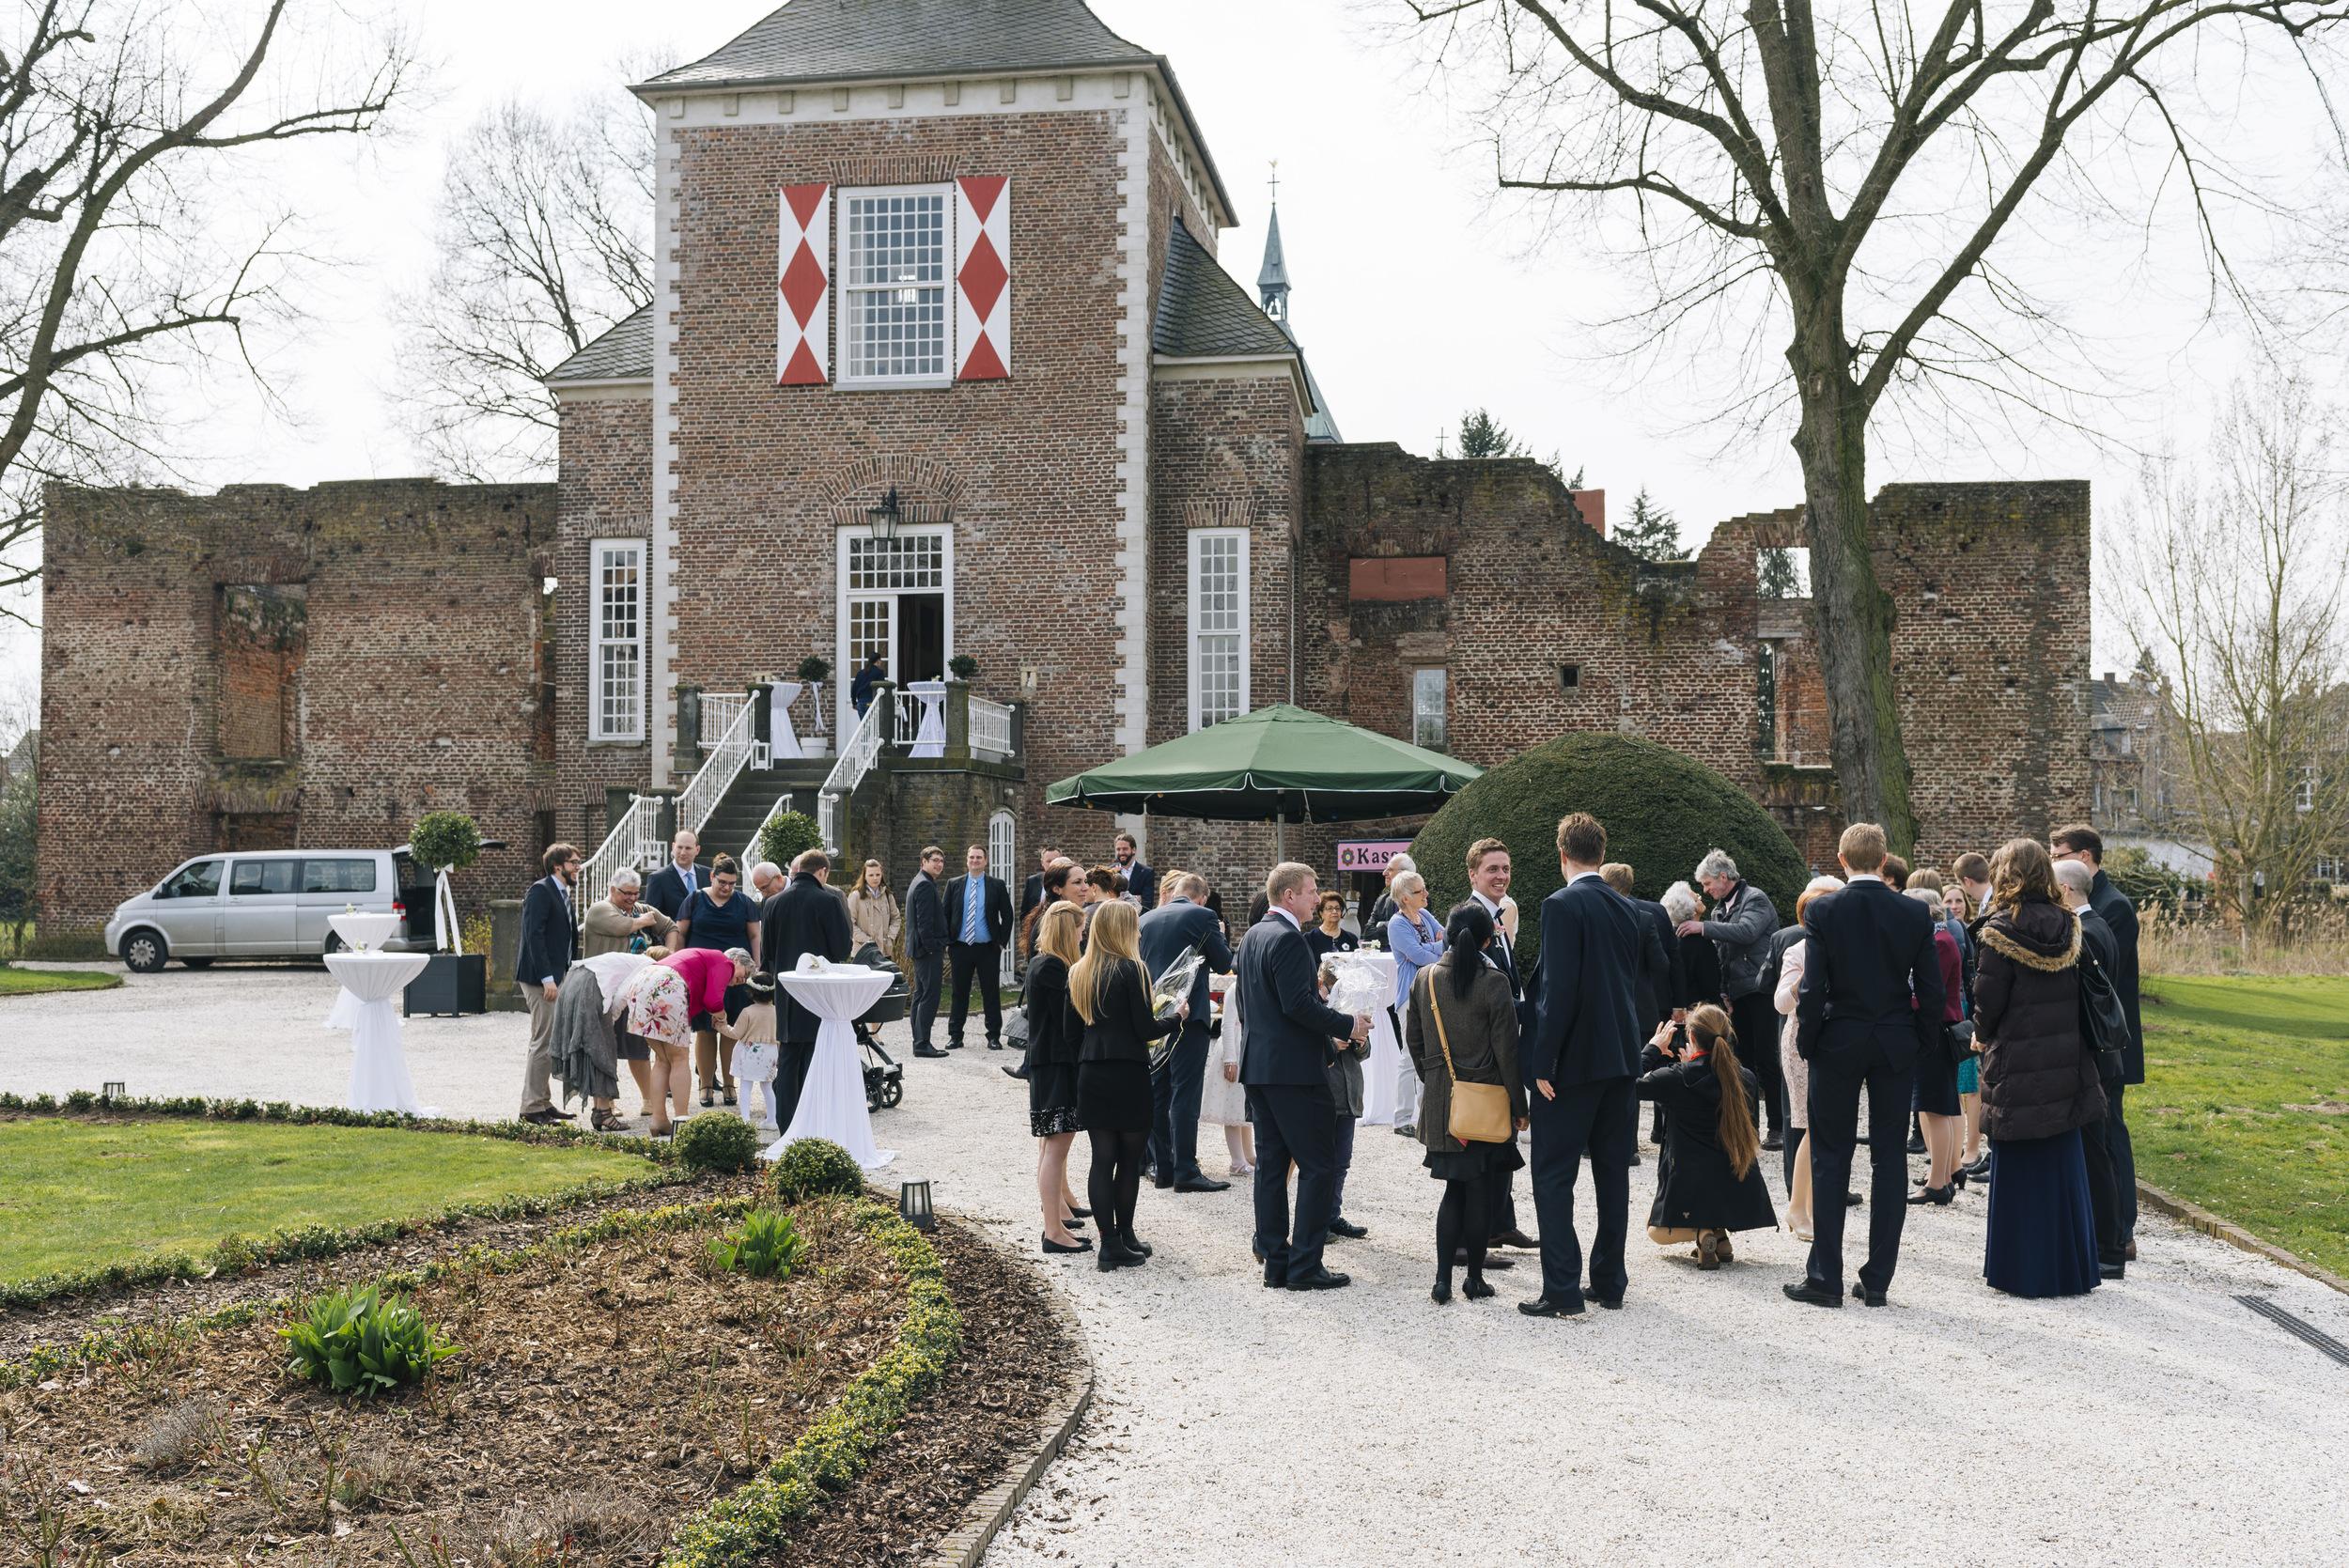 Hochzeitsfotograf-Schlossruine-Hertefeld-Weeze-051.jpg